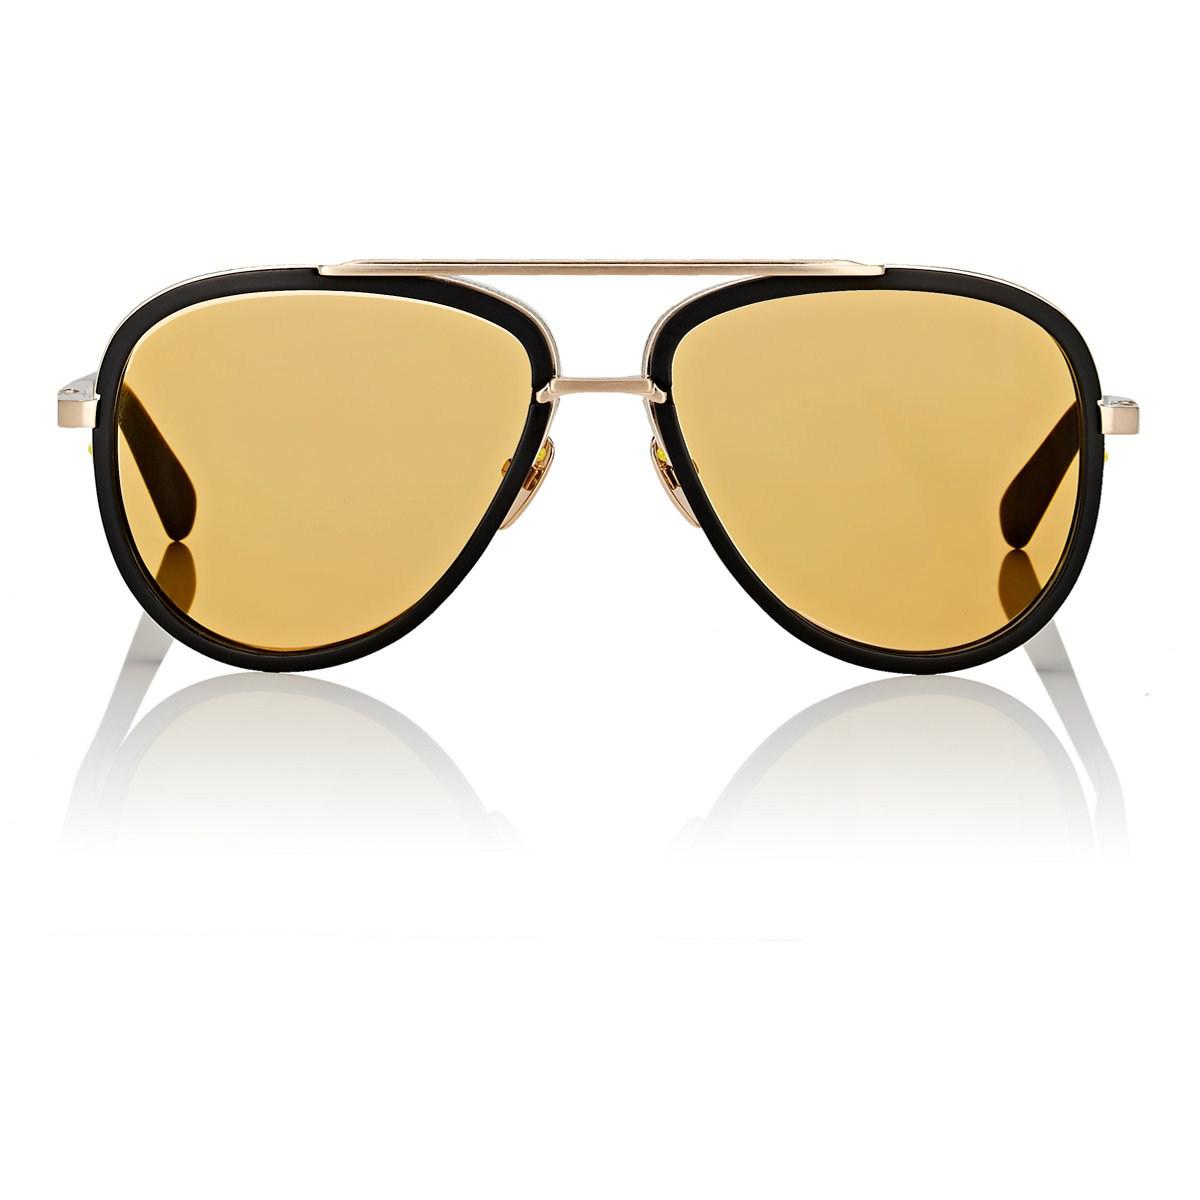 5fec68a73ed Lyst - DITA Mach-two Sunglasses in Black for Men